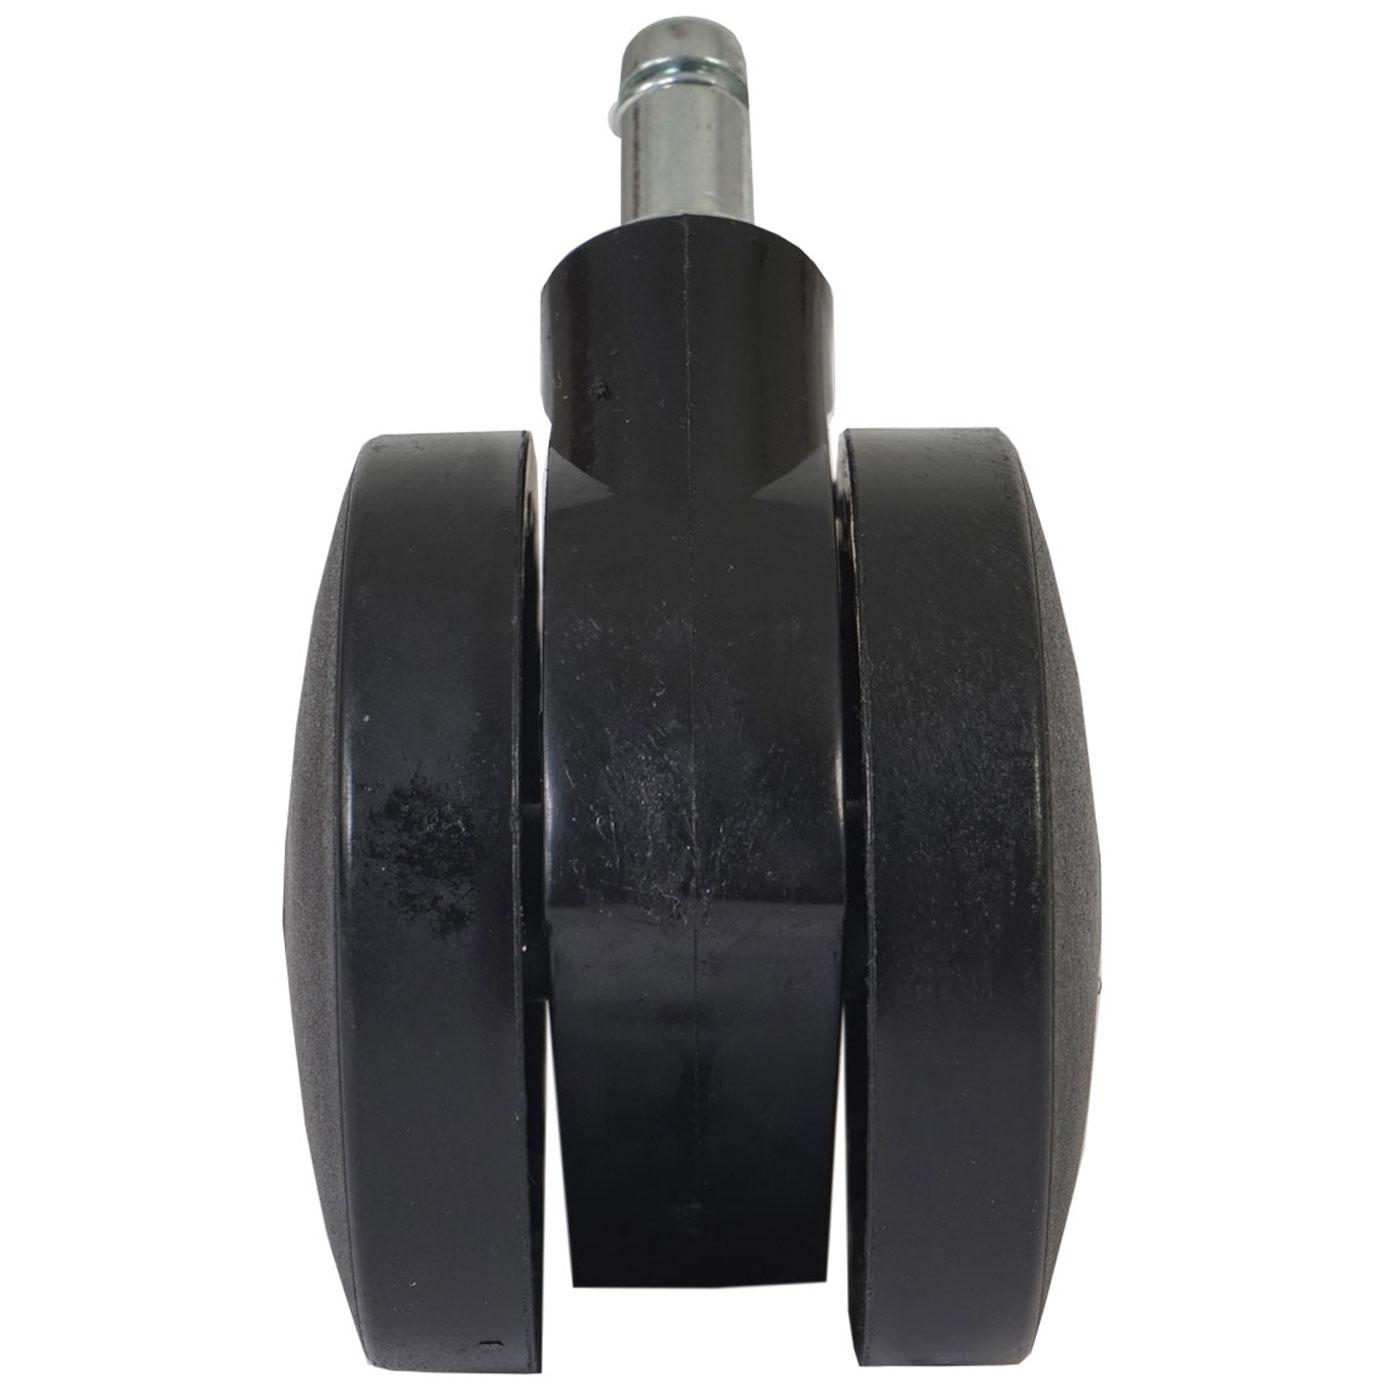 5x universalrollen t533 b rostuhl rollen stuhlrollen 150kg belastbar schwerlast. Black Bedroom Furniture Sets. Home Design Ideas